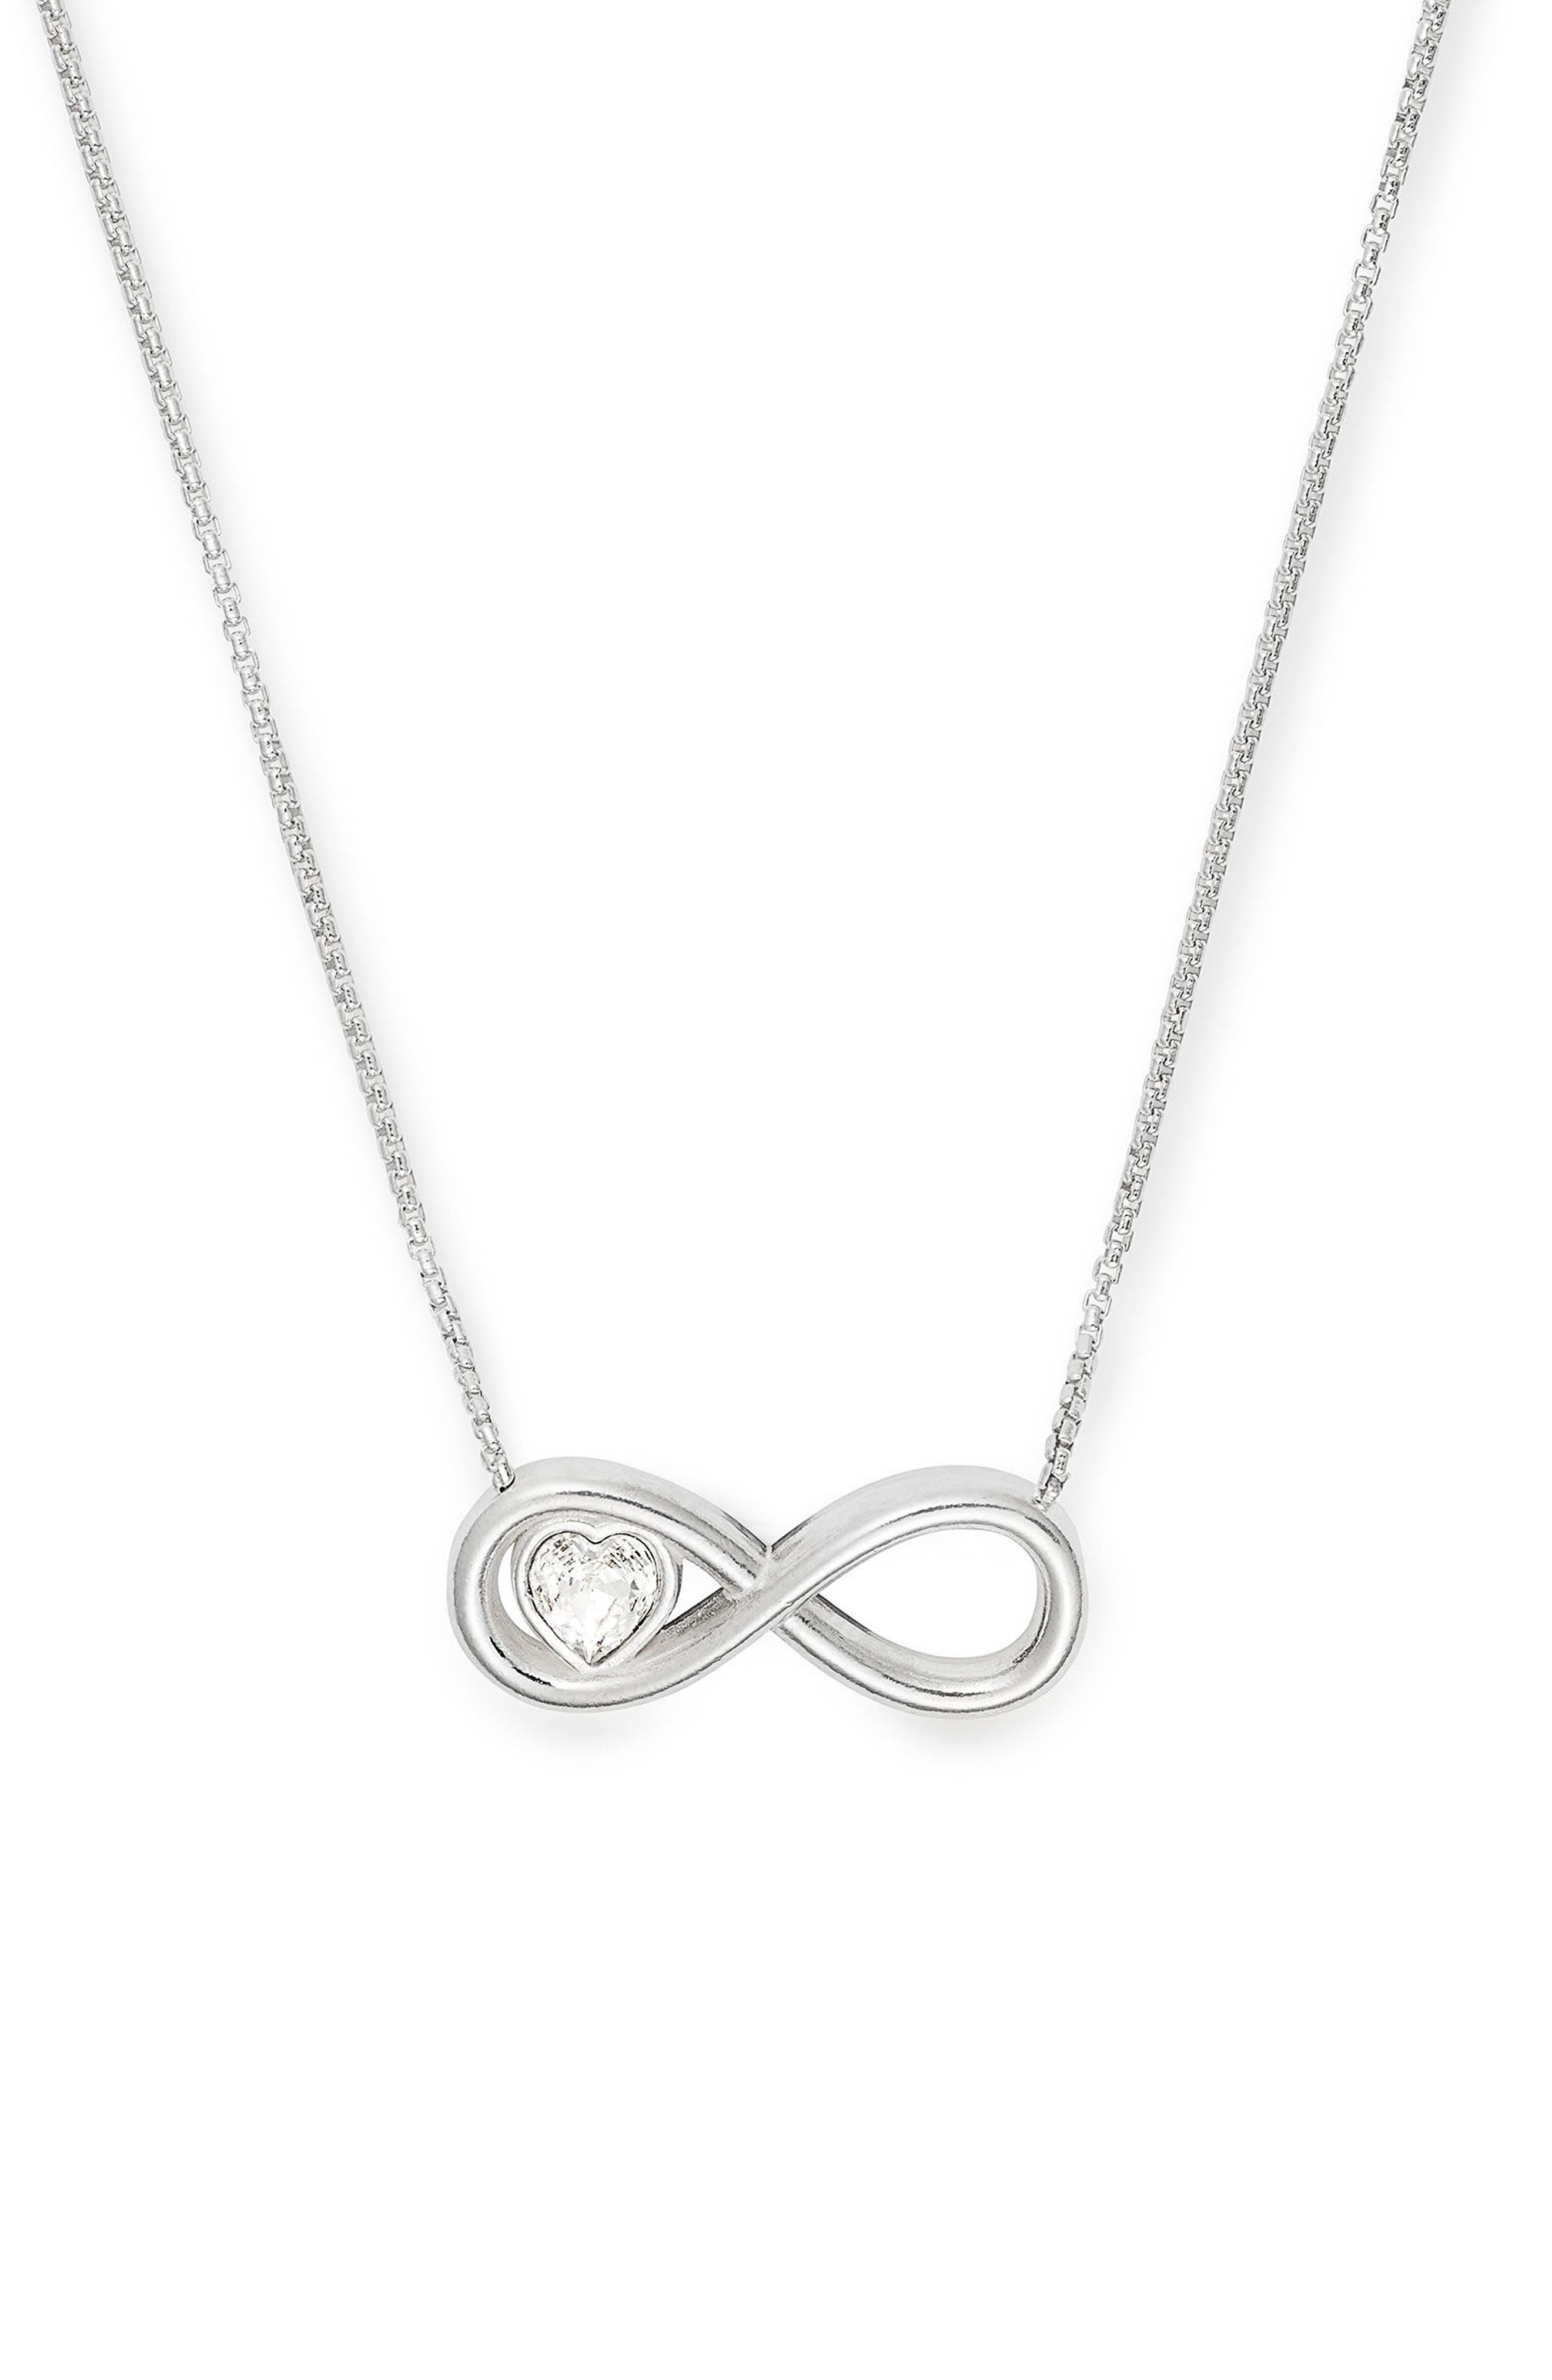 Alex and Ani Infinite Love Necklace